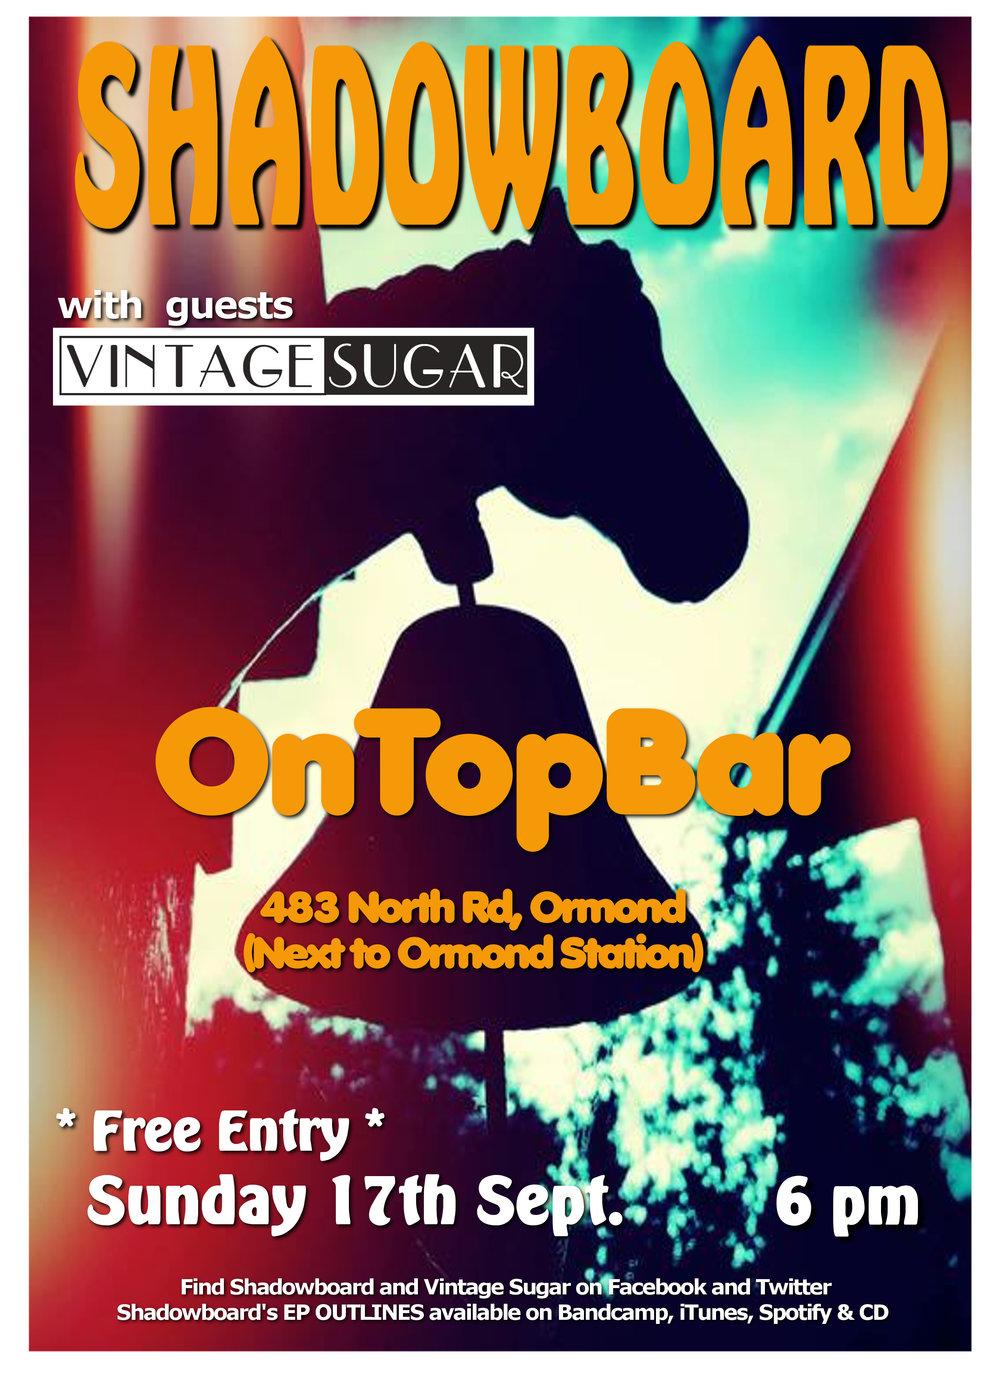 Shadowboard & VS - On Top Bar 17Sep17 V1 (1).jpg